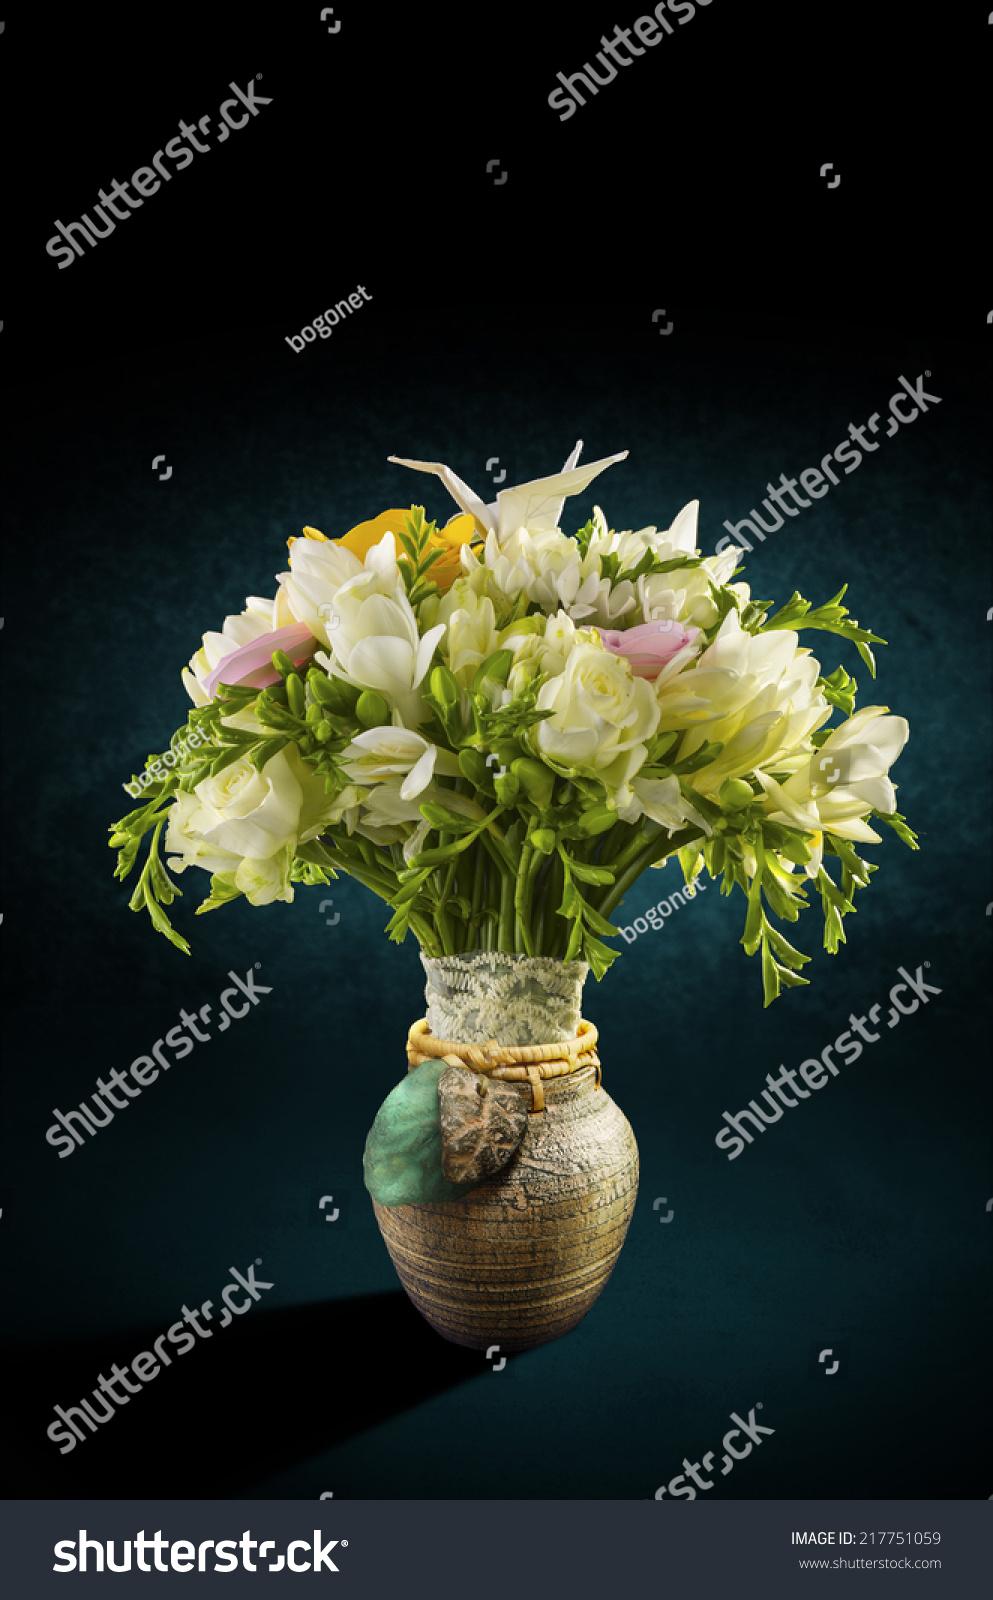 Bouquet Flowers Decorative Vase Ornated Origami Stock Photo Edit